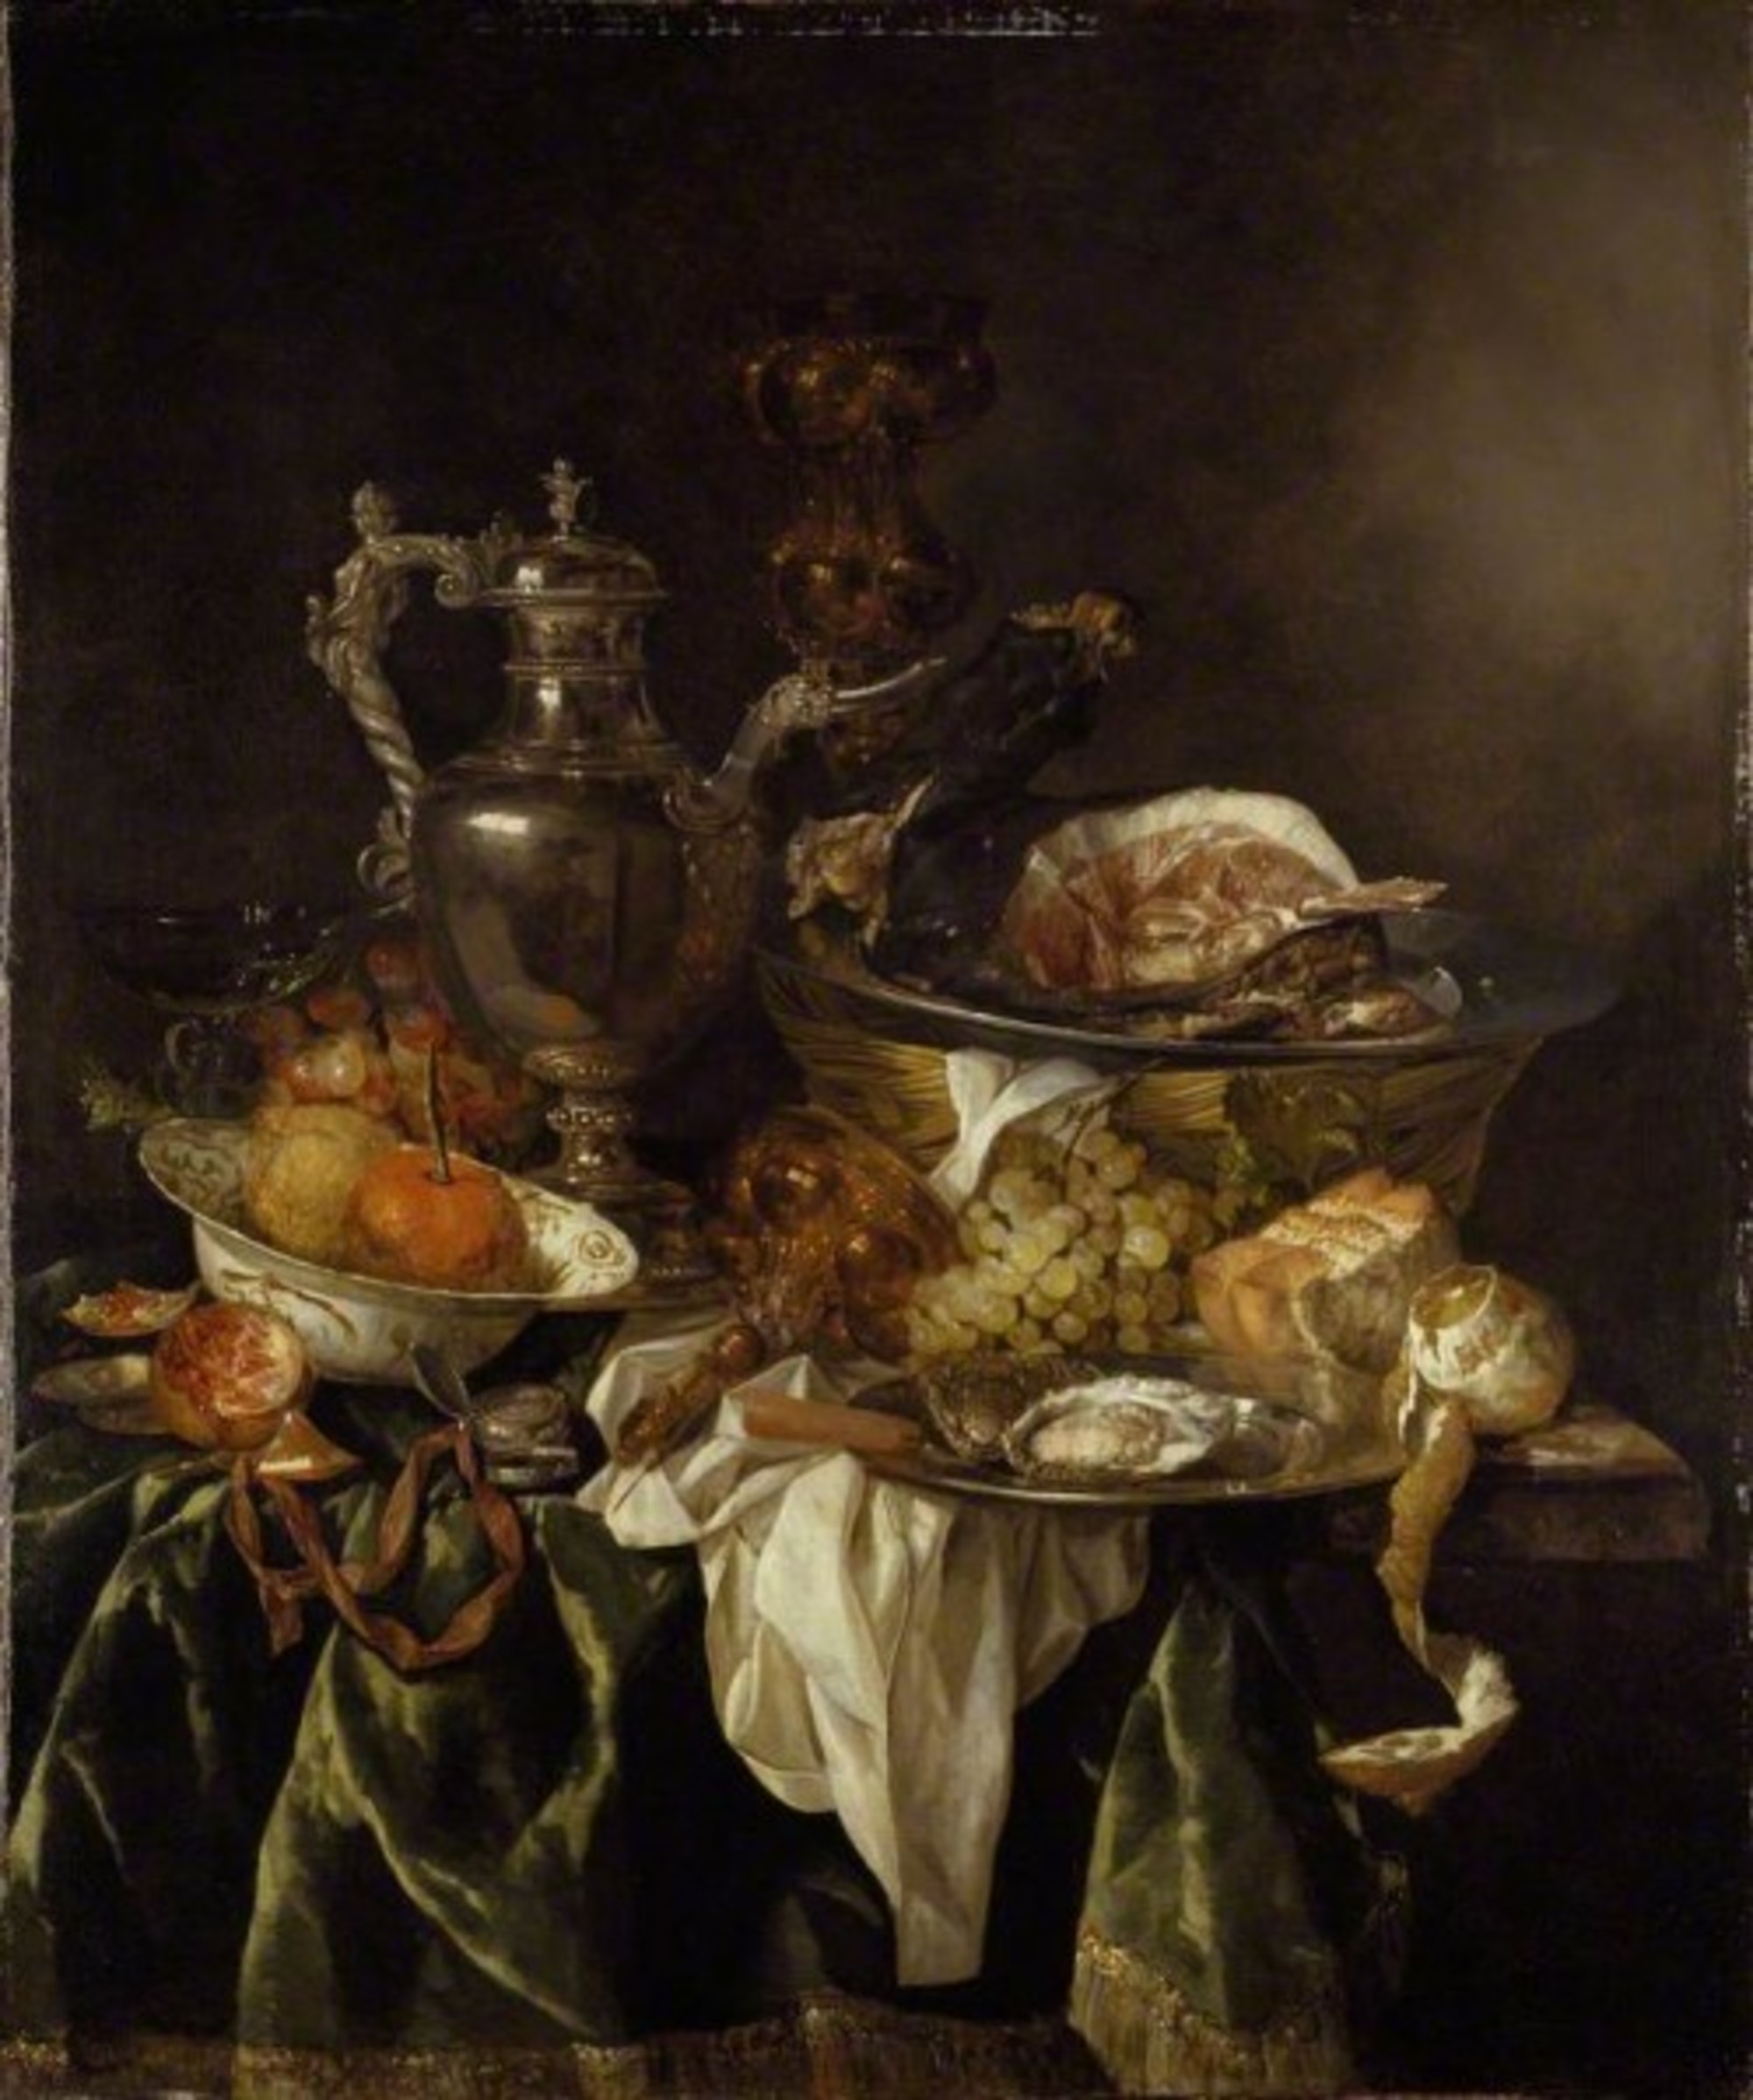 Abraham-van-Beyeren---Still-Life-with-a-silver-Wine-jar-and-a-reflected-Portrait-of-the-Artist-ASH-ASHM-WA1940-2-10.jpg